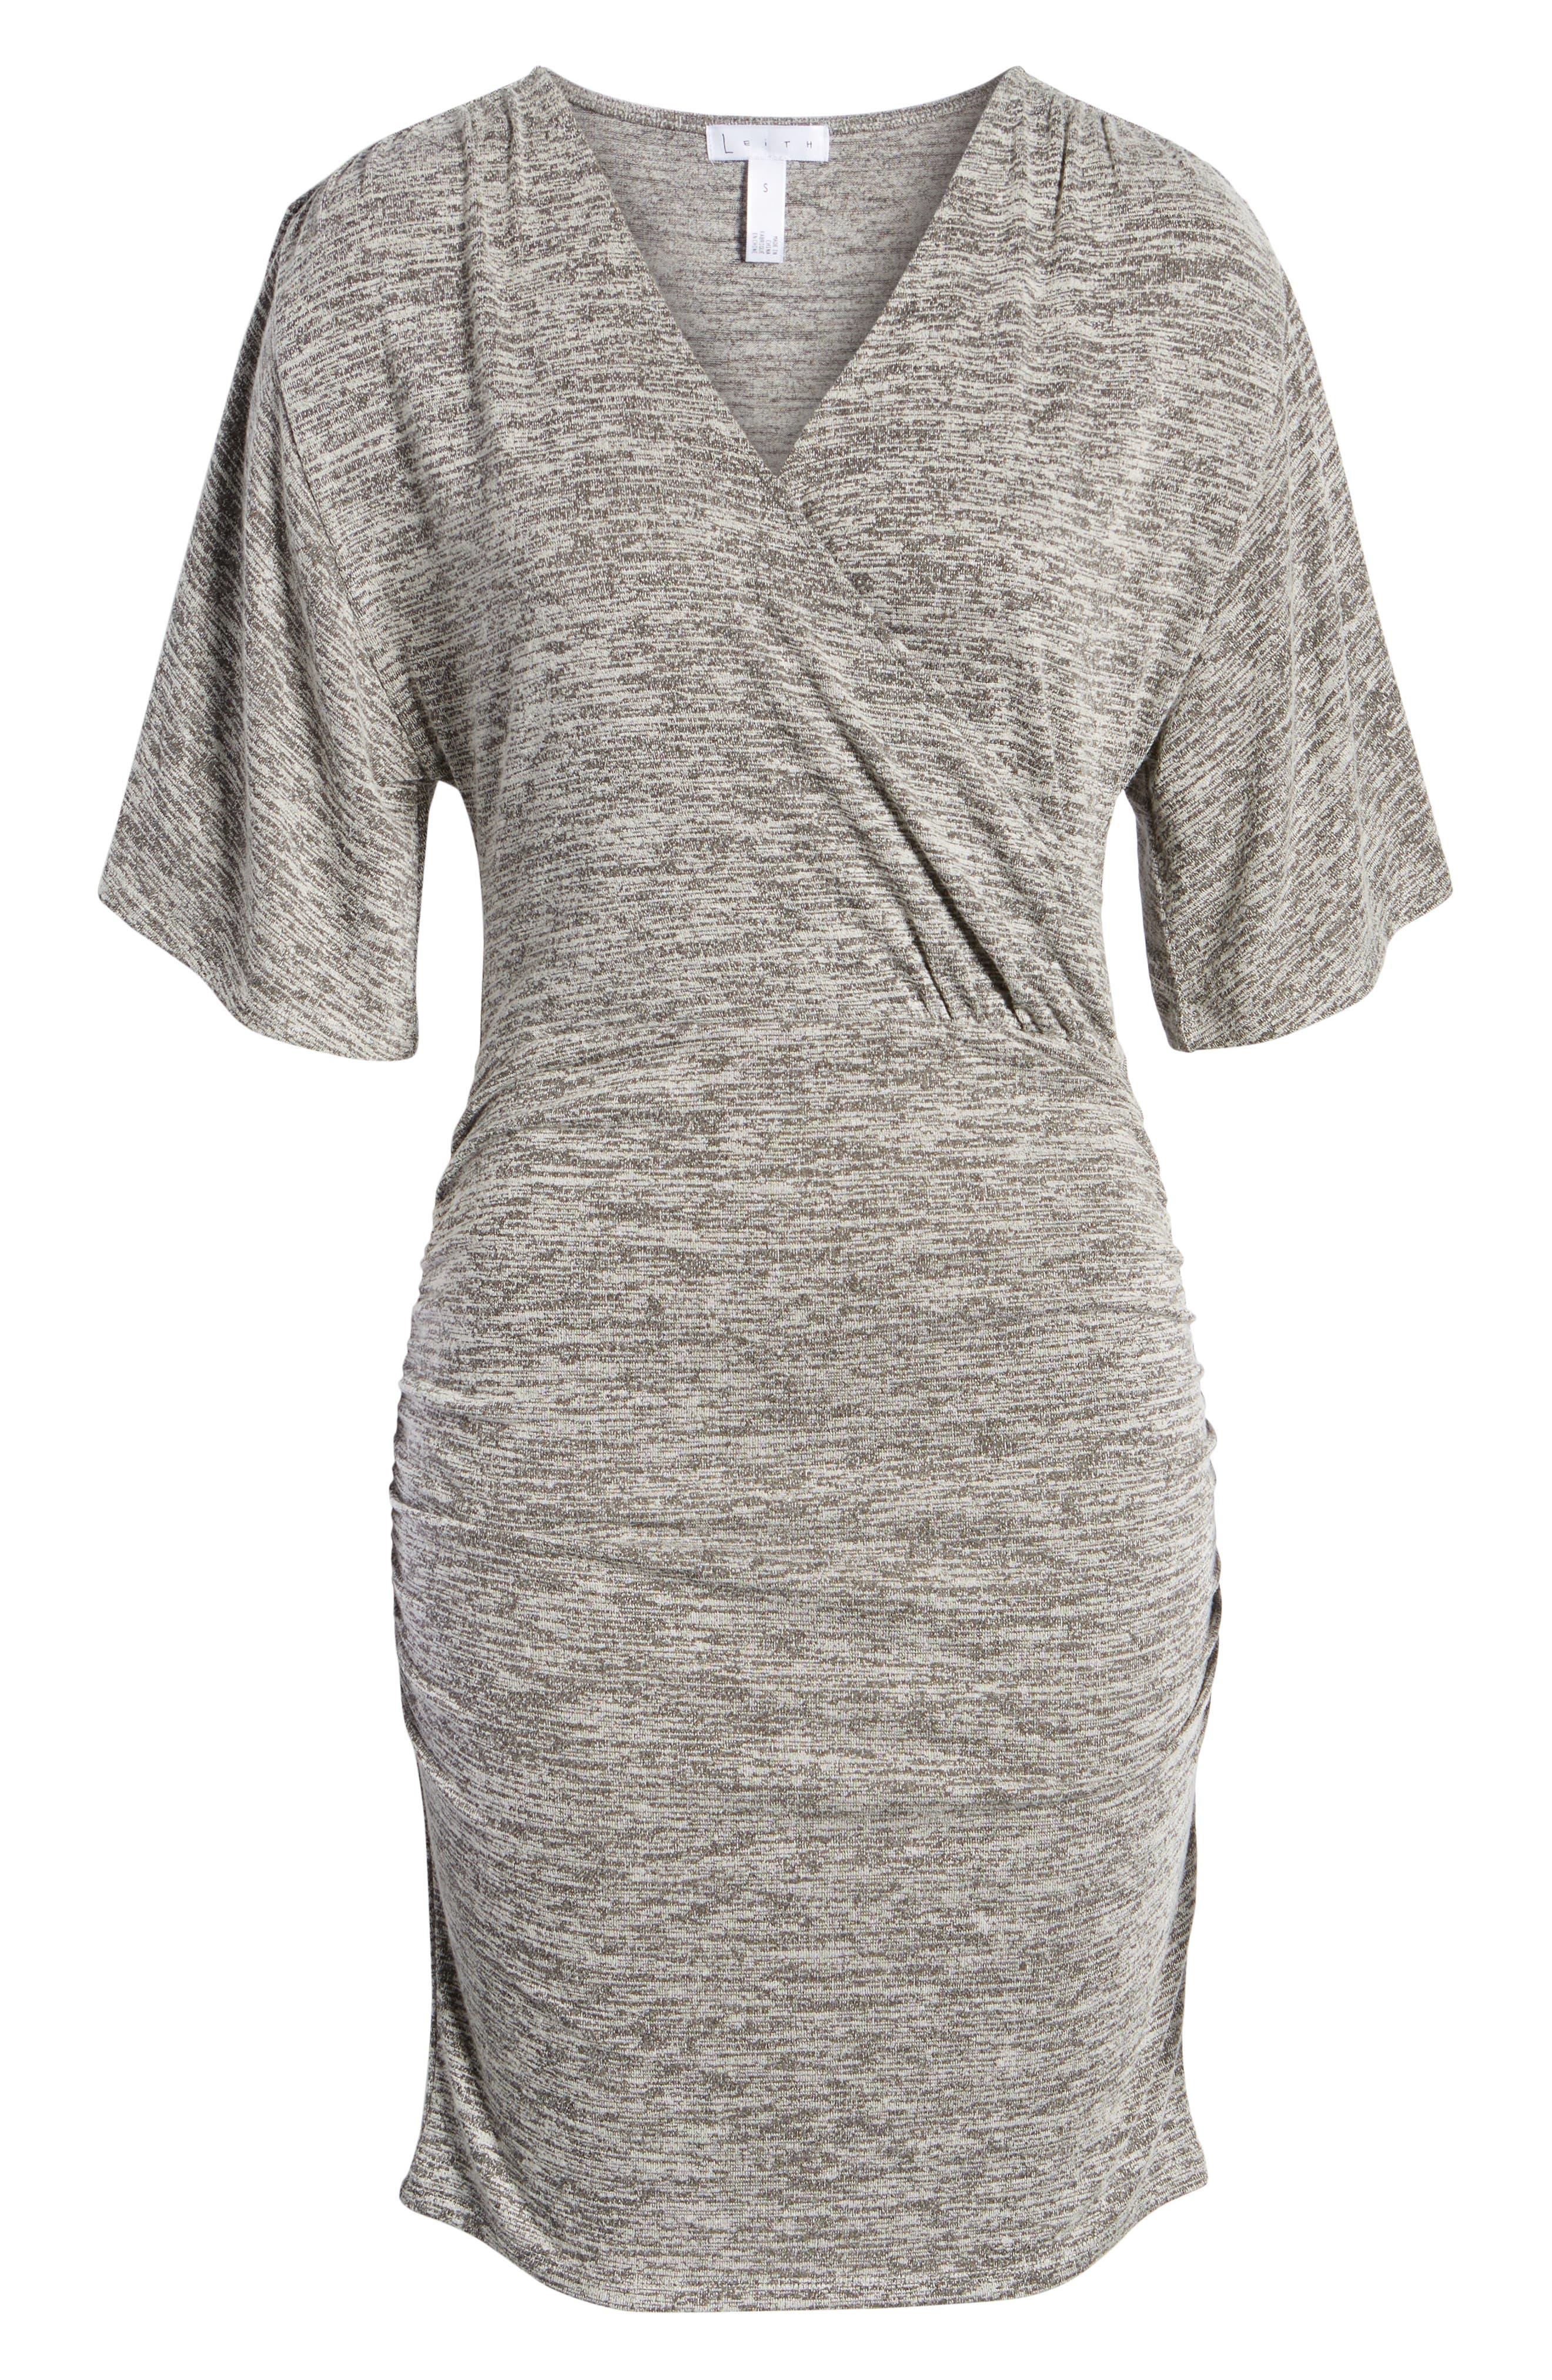 Wrap Dress,                             Alternate thumbnail 7, color,                             GREY CLOUDY HEATHER